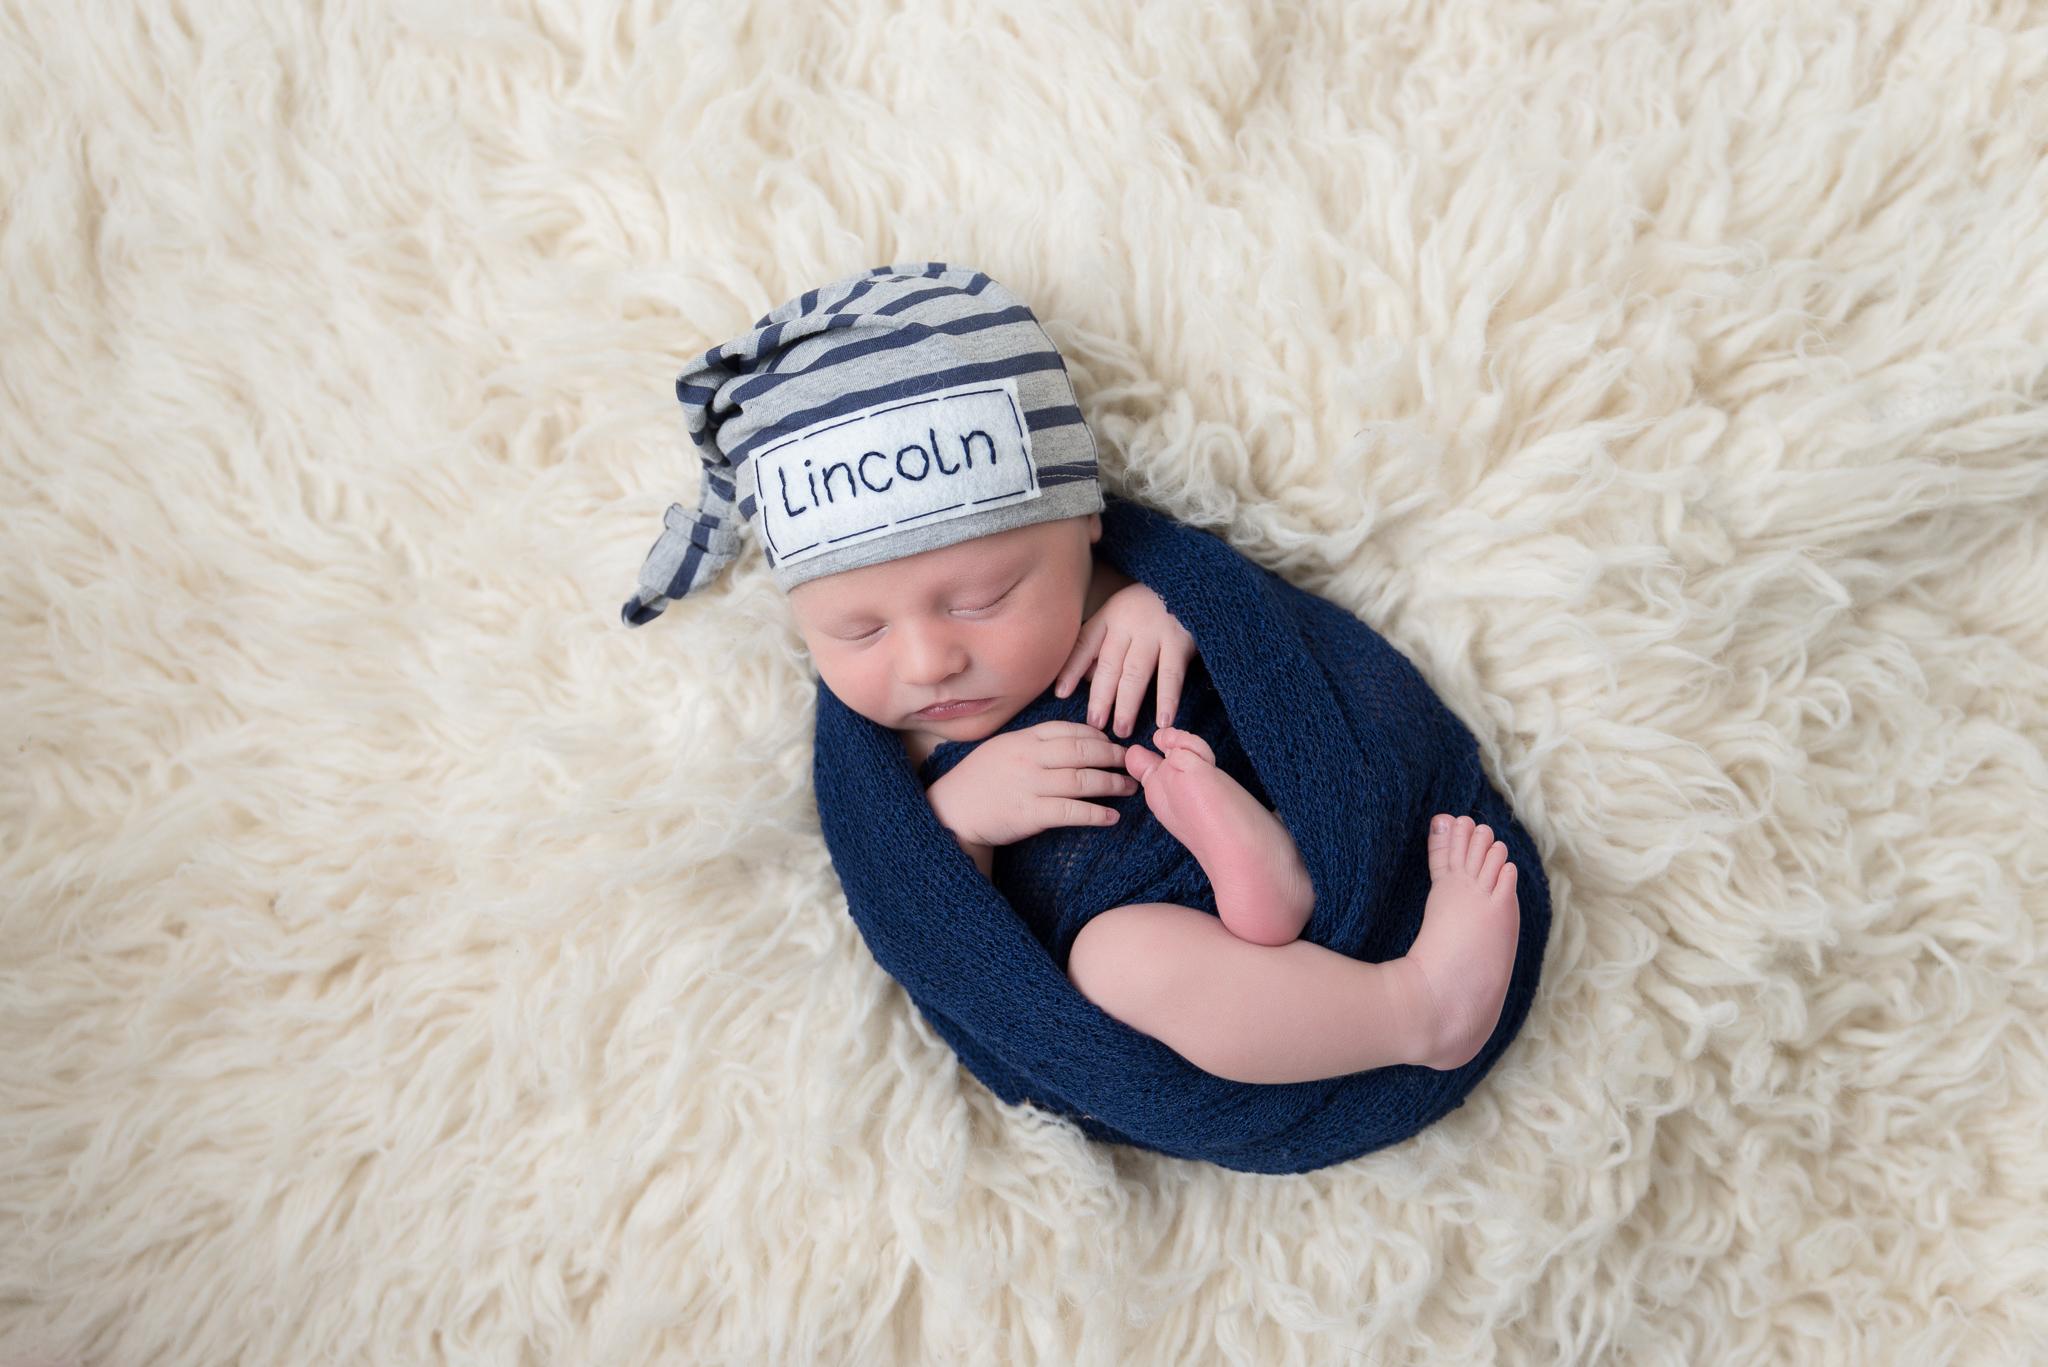 Chevy-chase-md-newborn-photographer71.jpg